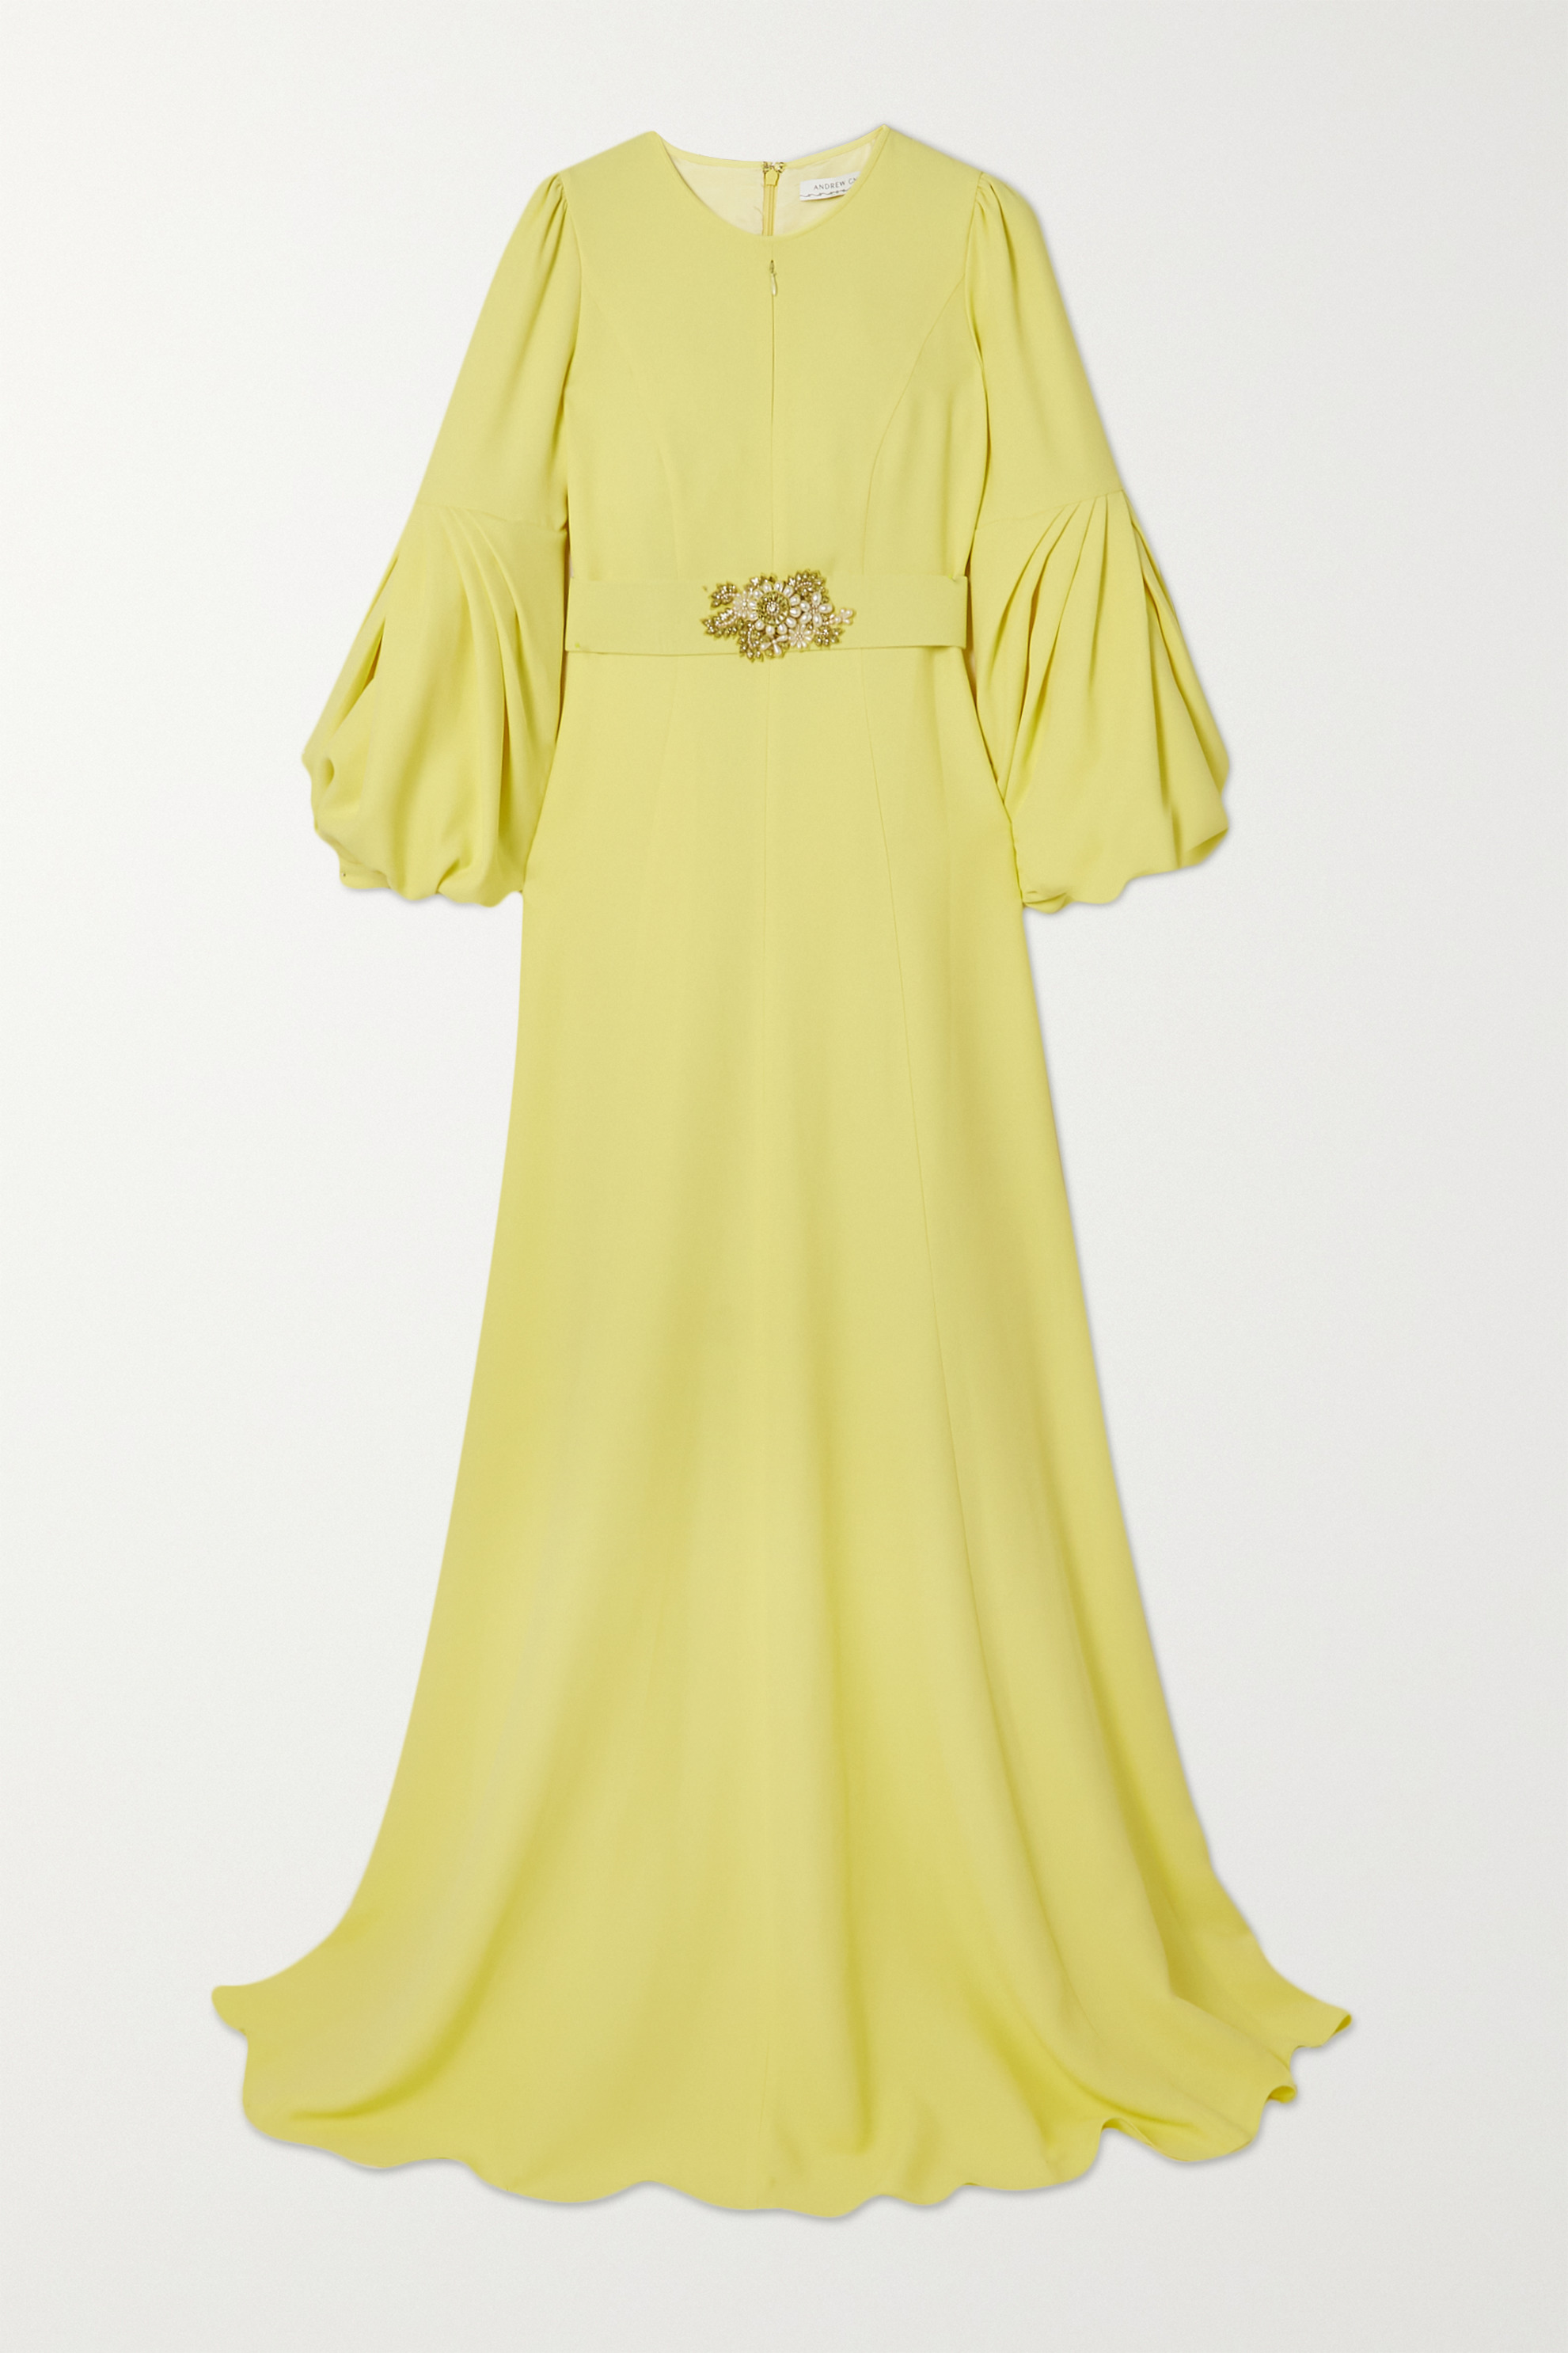 Net-a-Porter celebrates modest fashion ahead of Ramadan (фото 5)